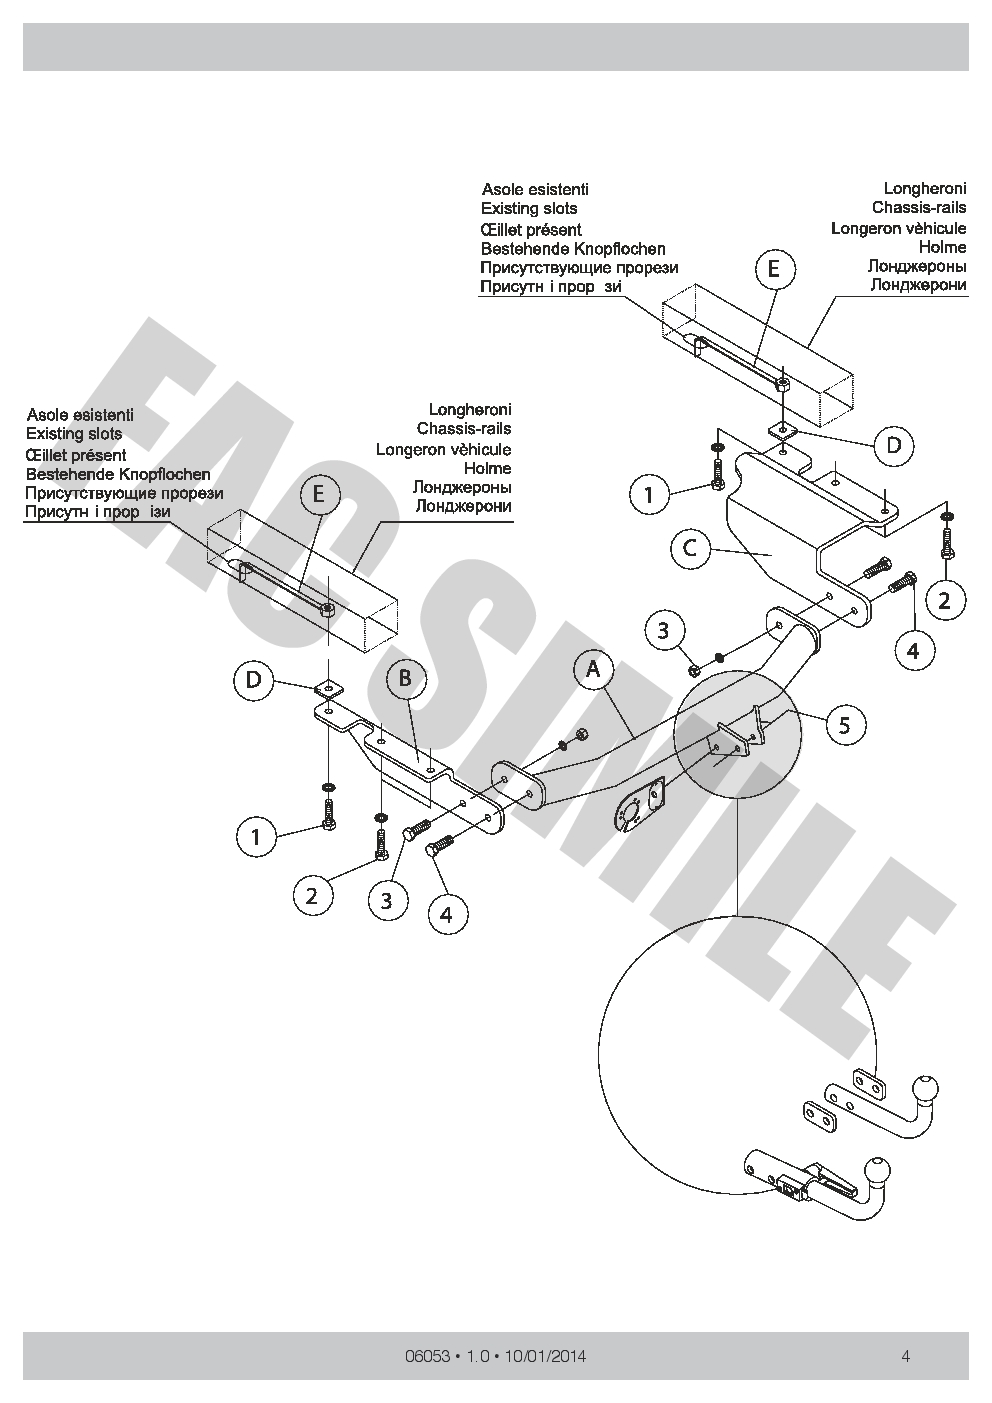 Tow Bar 06053/_A2 Swan Neck Towbar For Chrysler Voyager 7 Pin Electrics MPV 2002